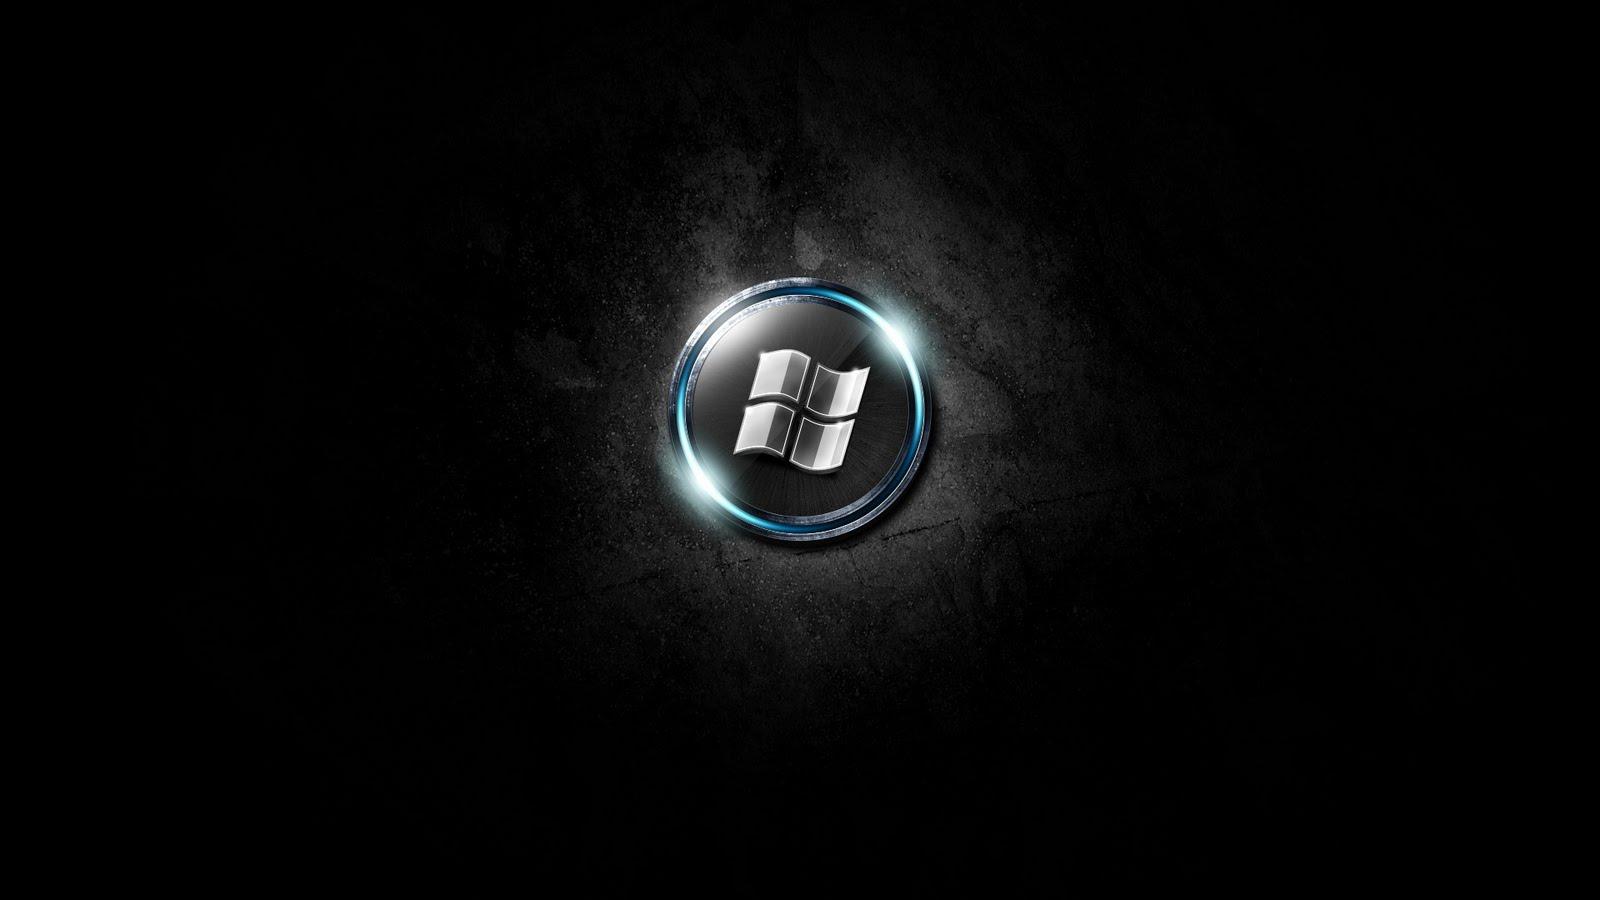 Cool Windows 7 Logo Full HD Wallpaper 1600x900